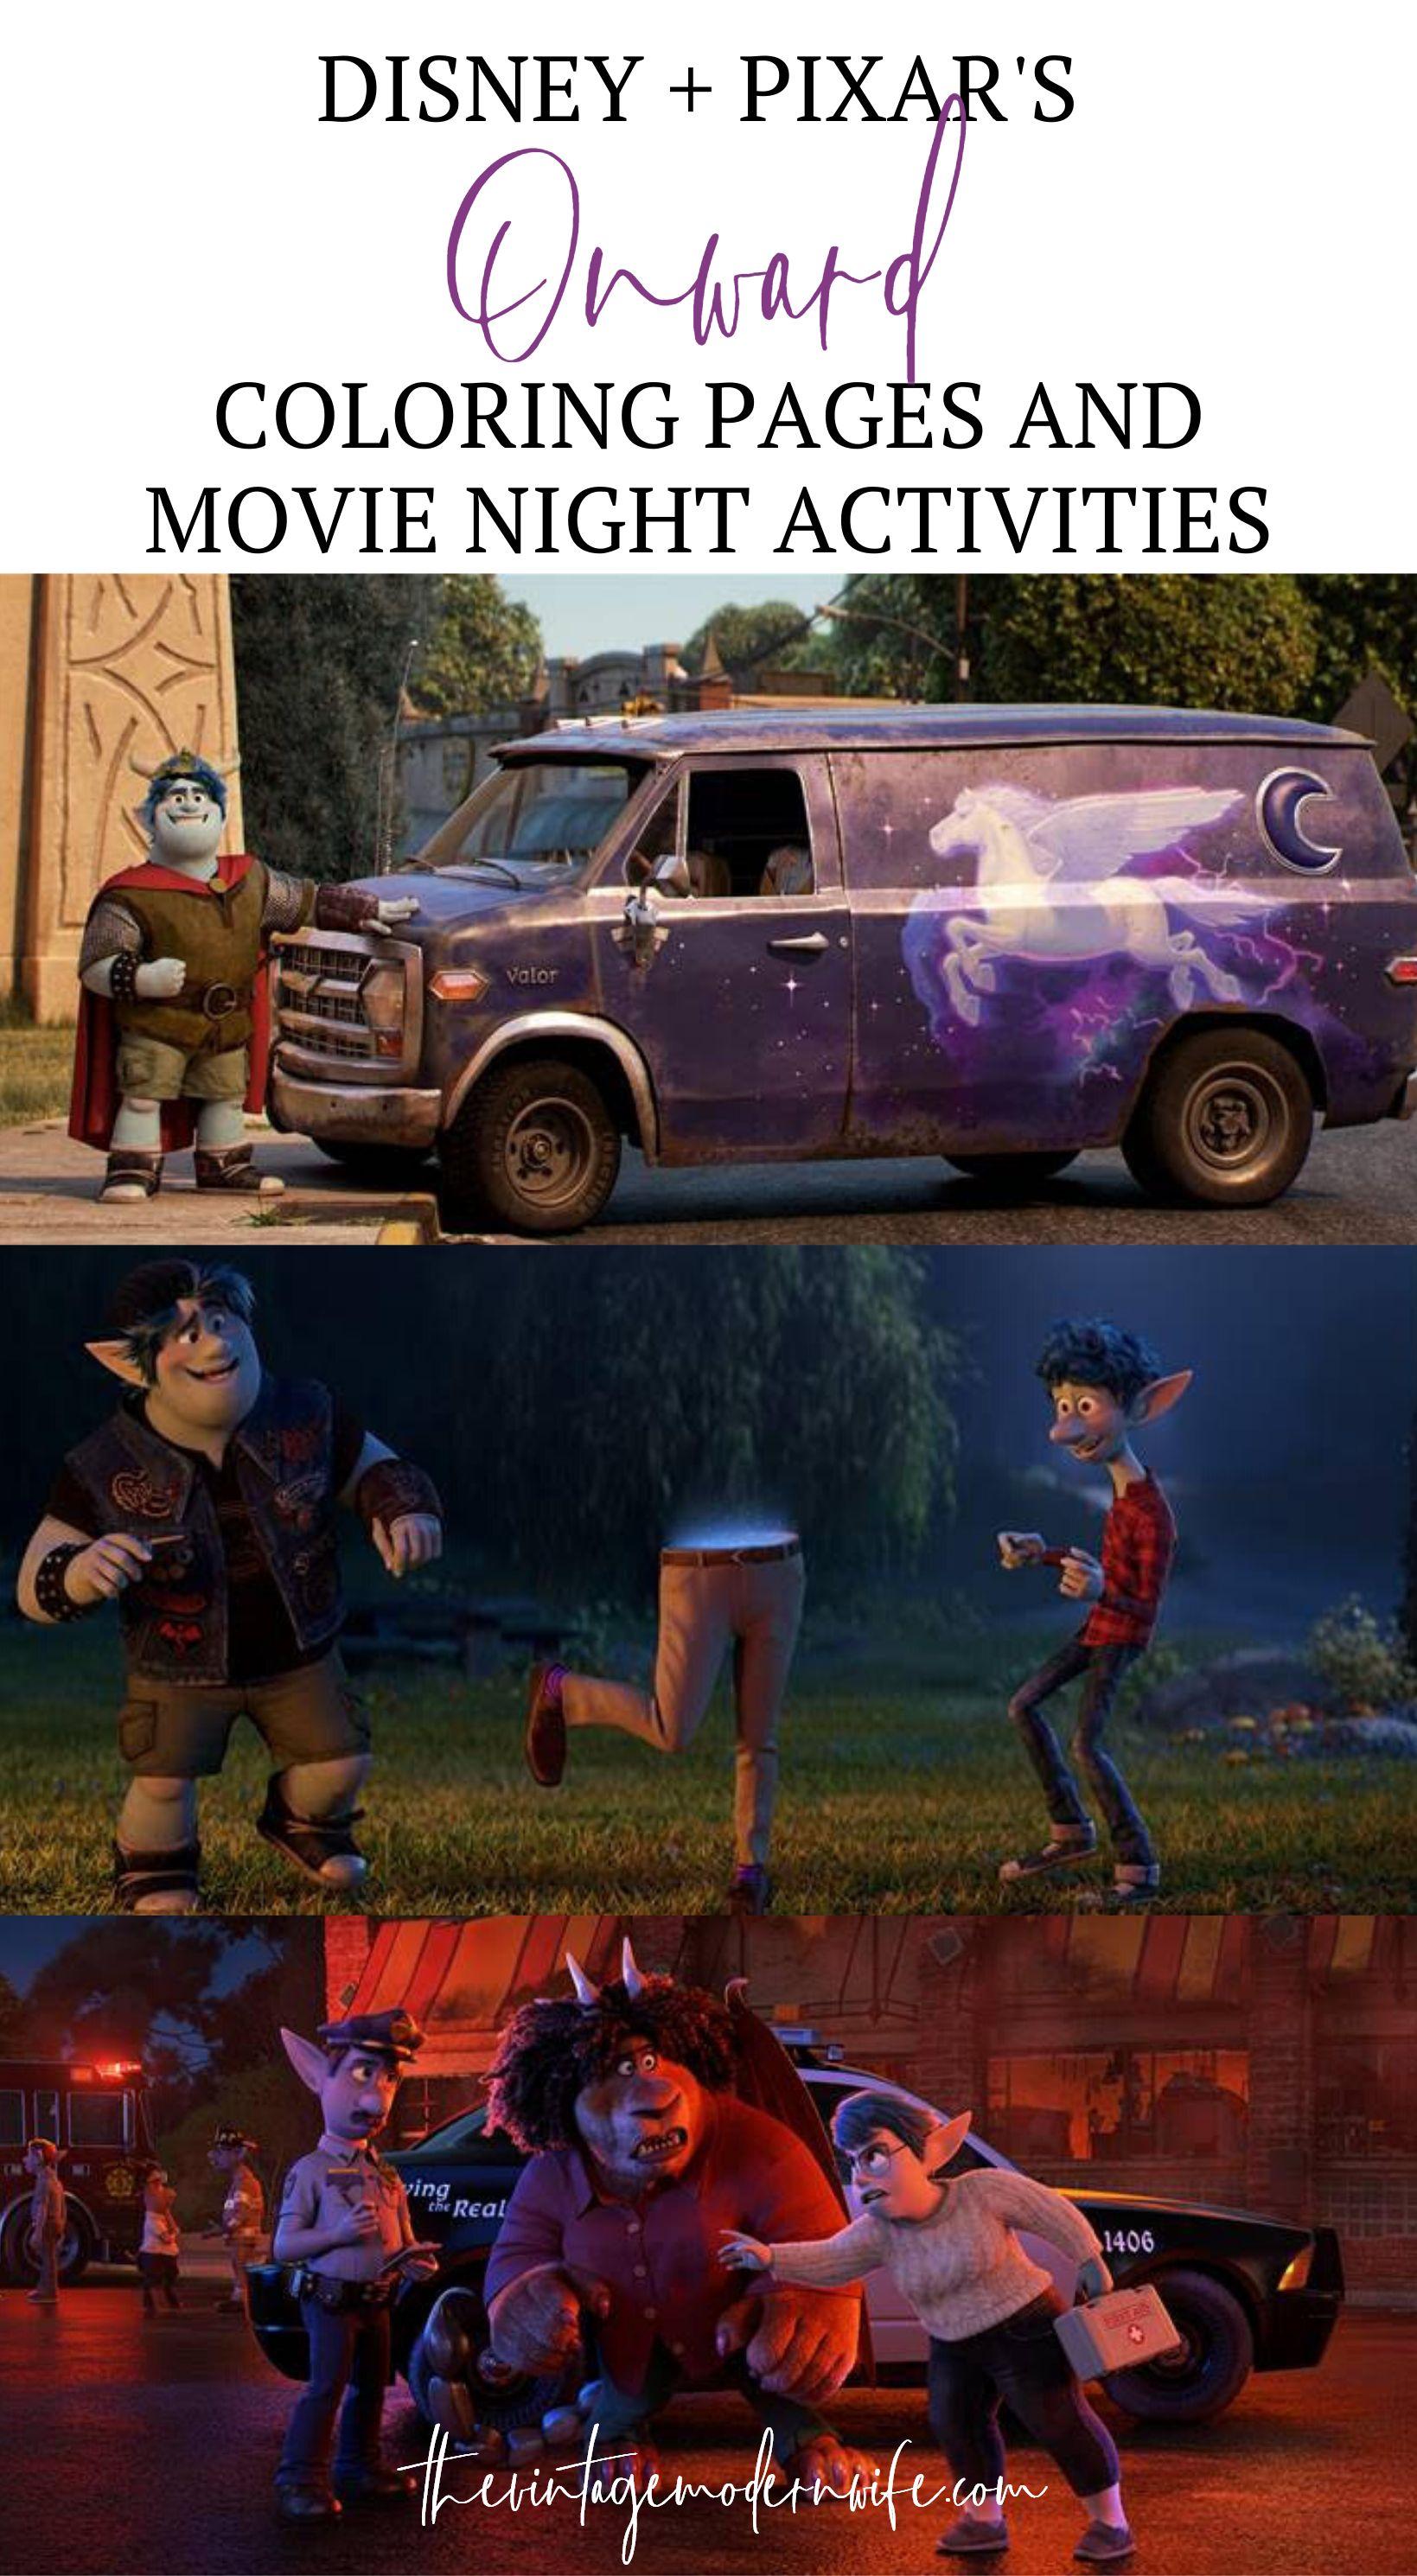 Disney + Pixar's Onward Coloring Pages and Movie Night